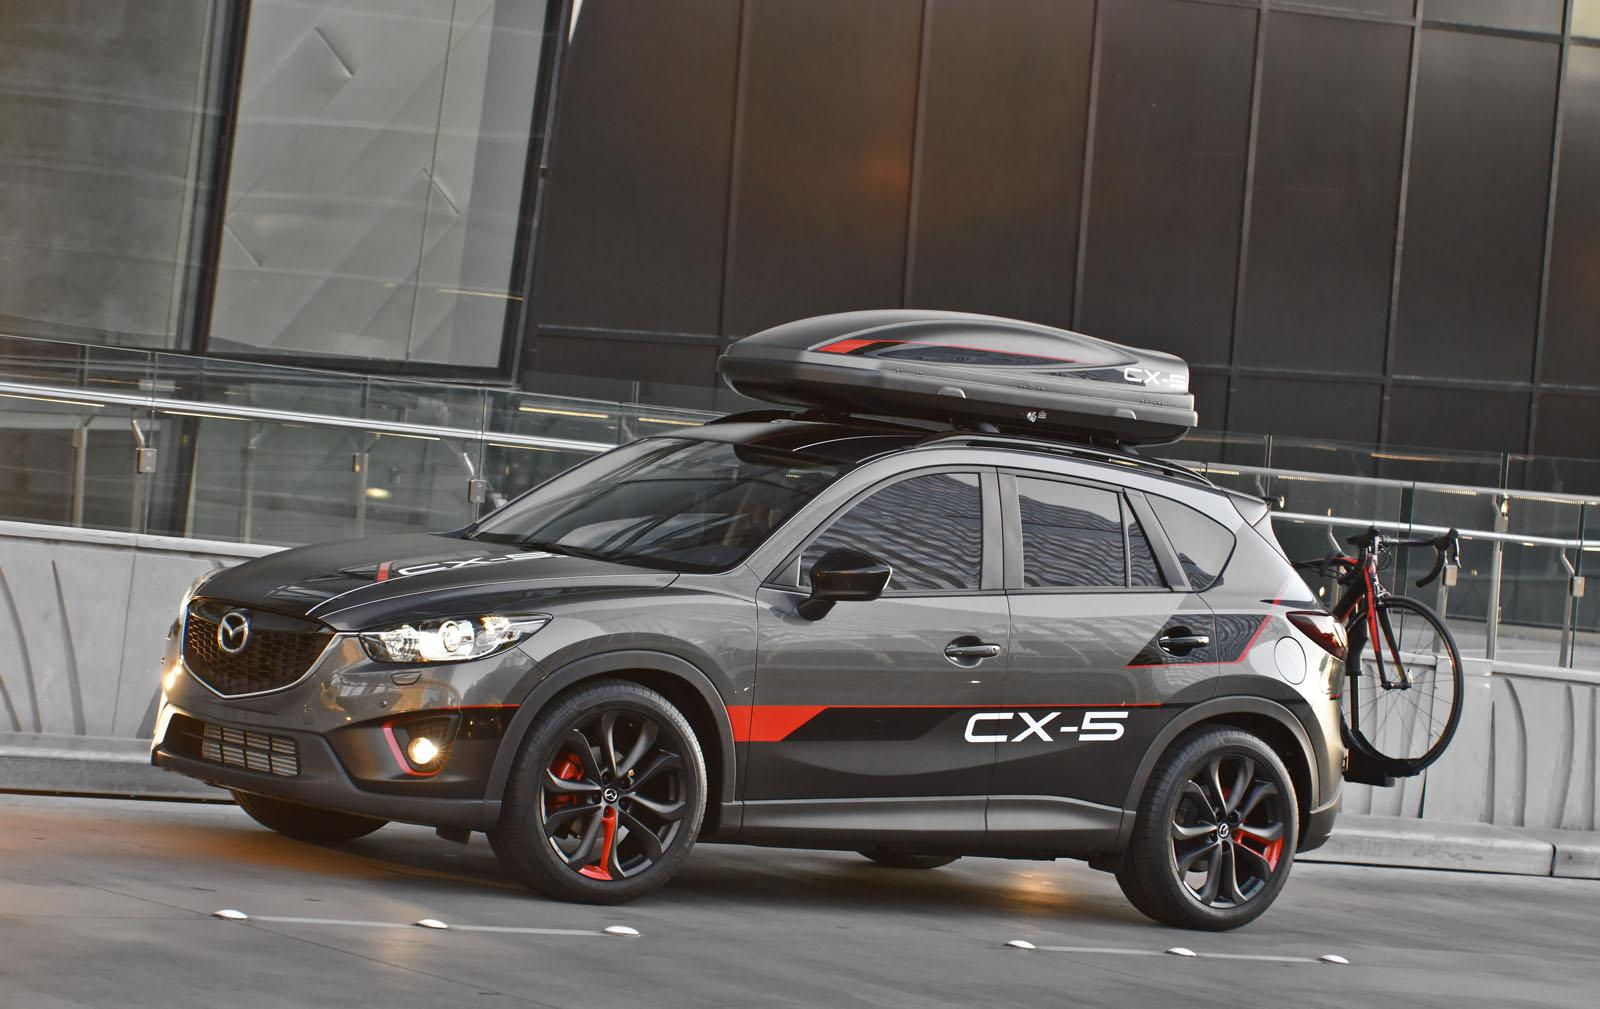 Mazda Cx5 Dempsey Brings Patrick Dempsey To 2012 Sema